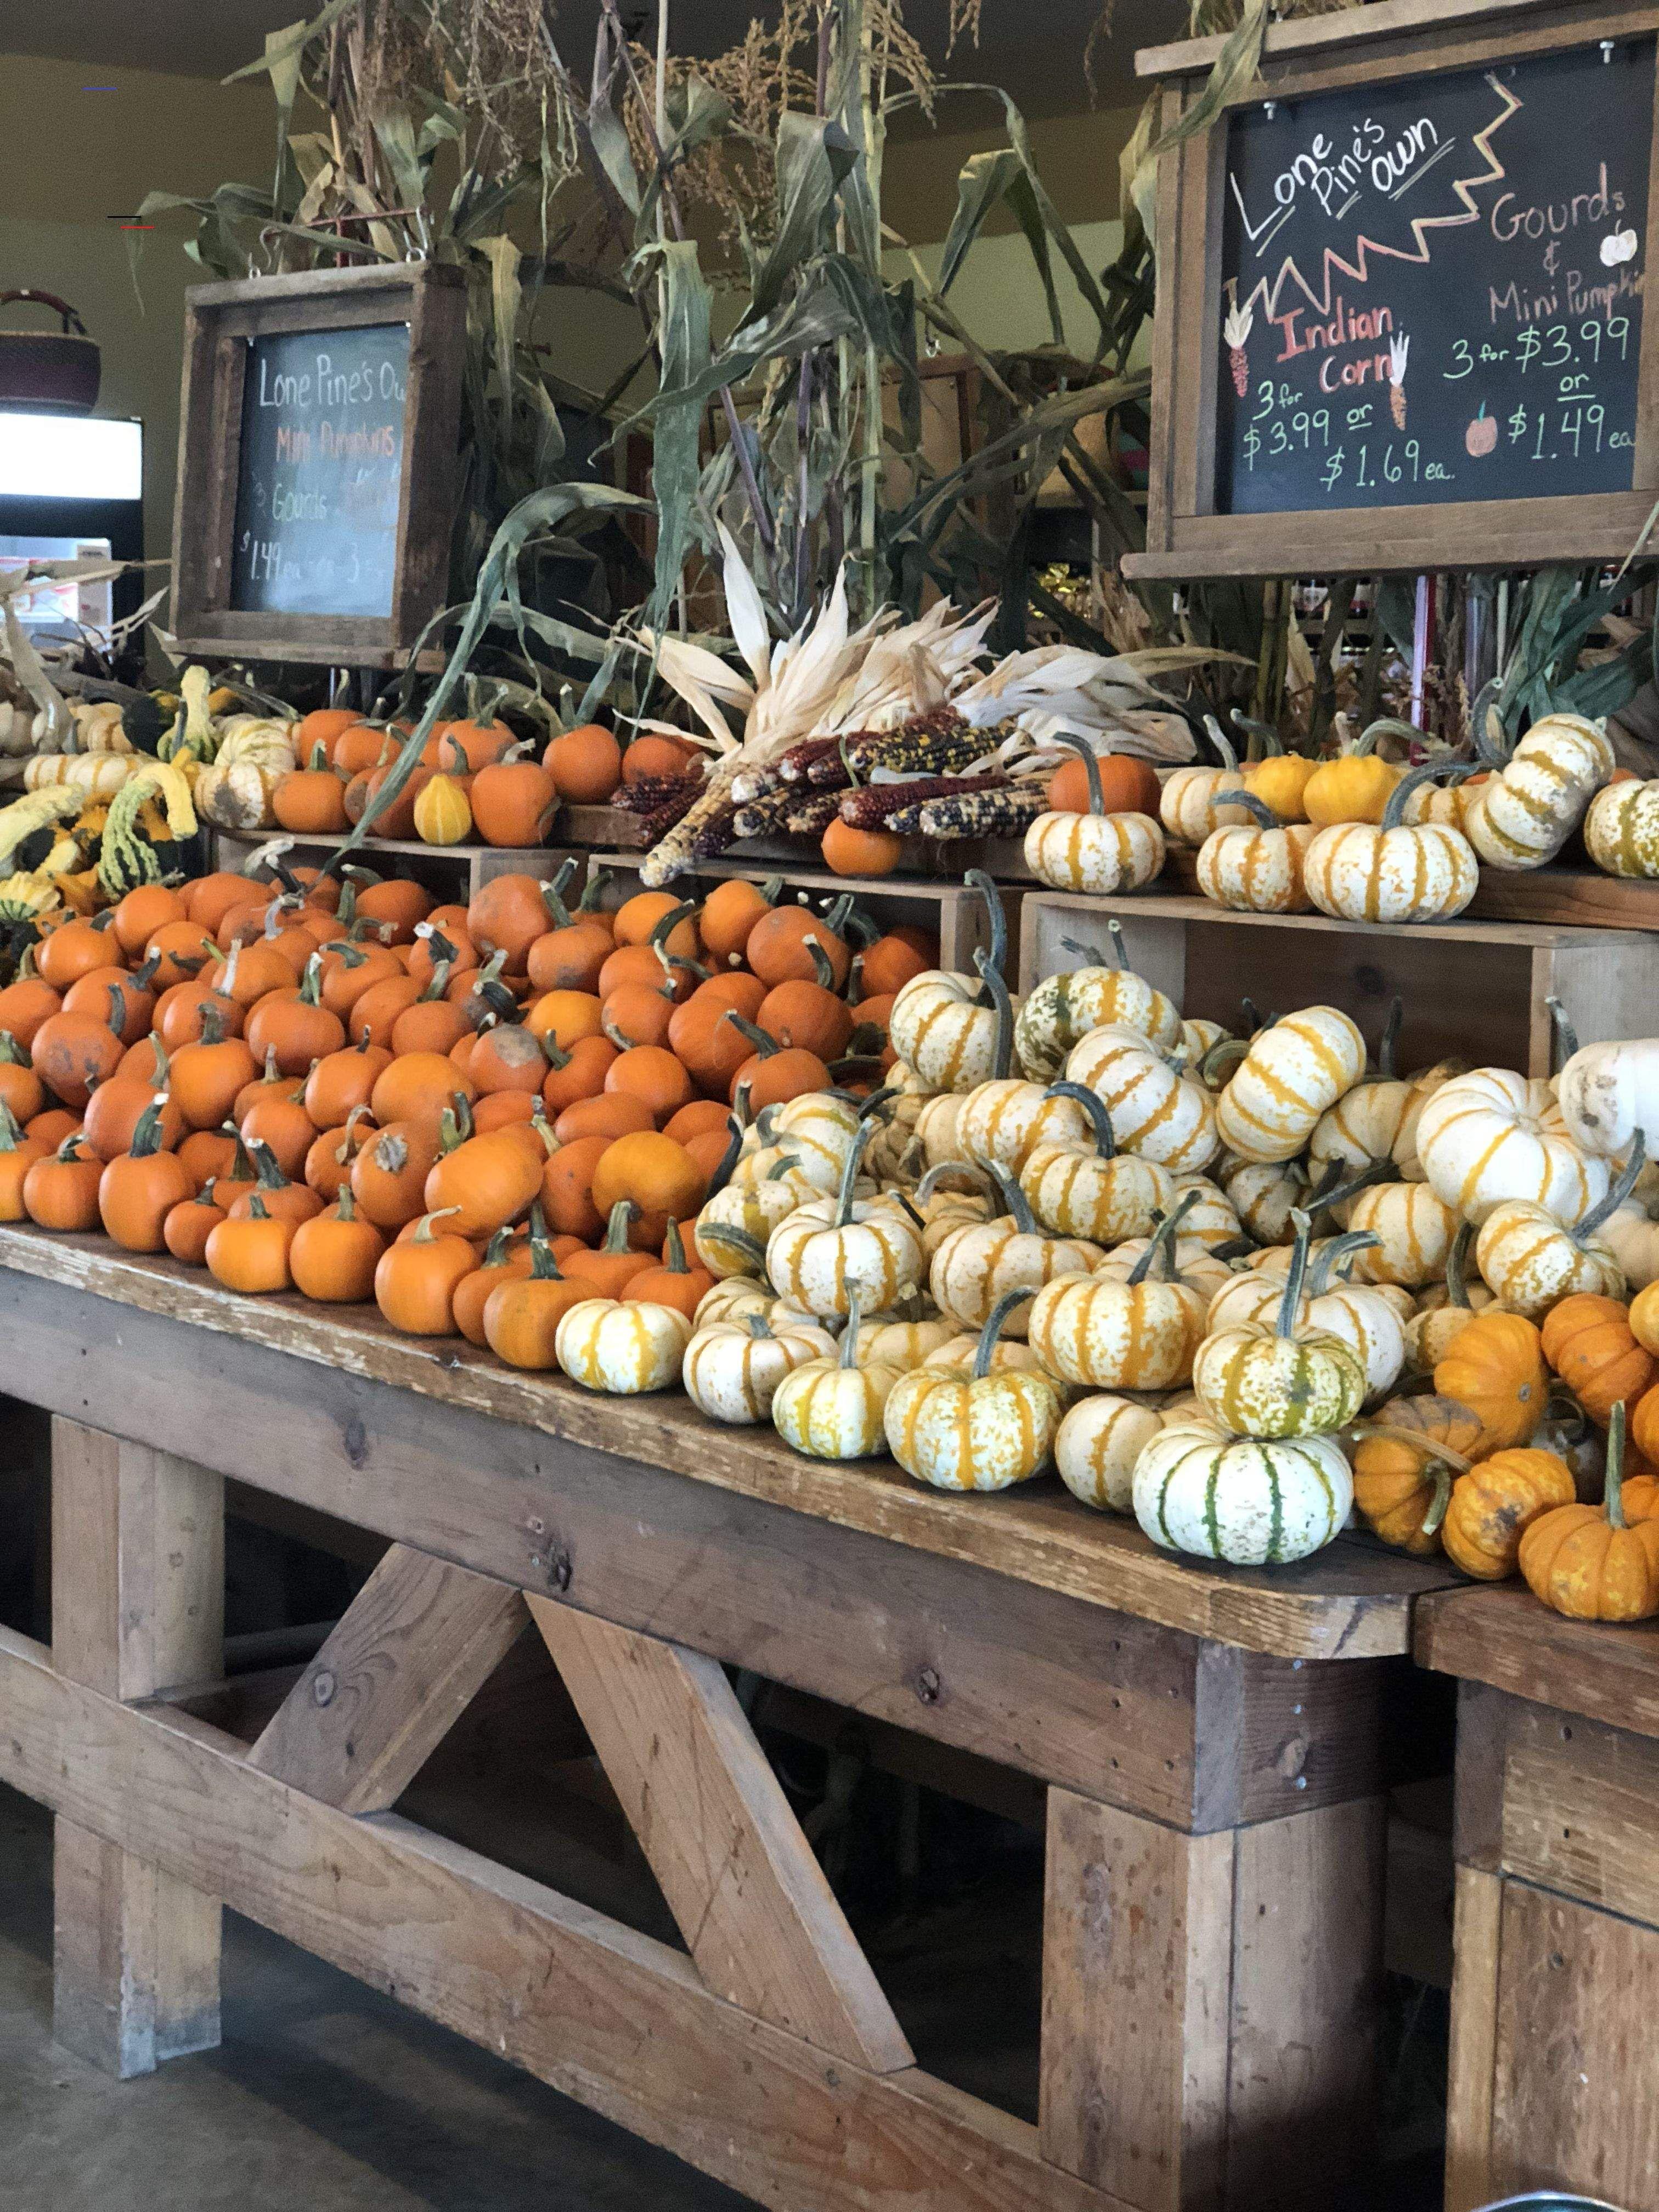 Pumpkin patch pumpkinpatch in 2020 Pumpkin patch farm